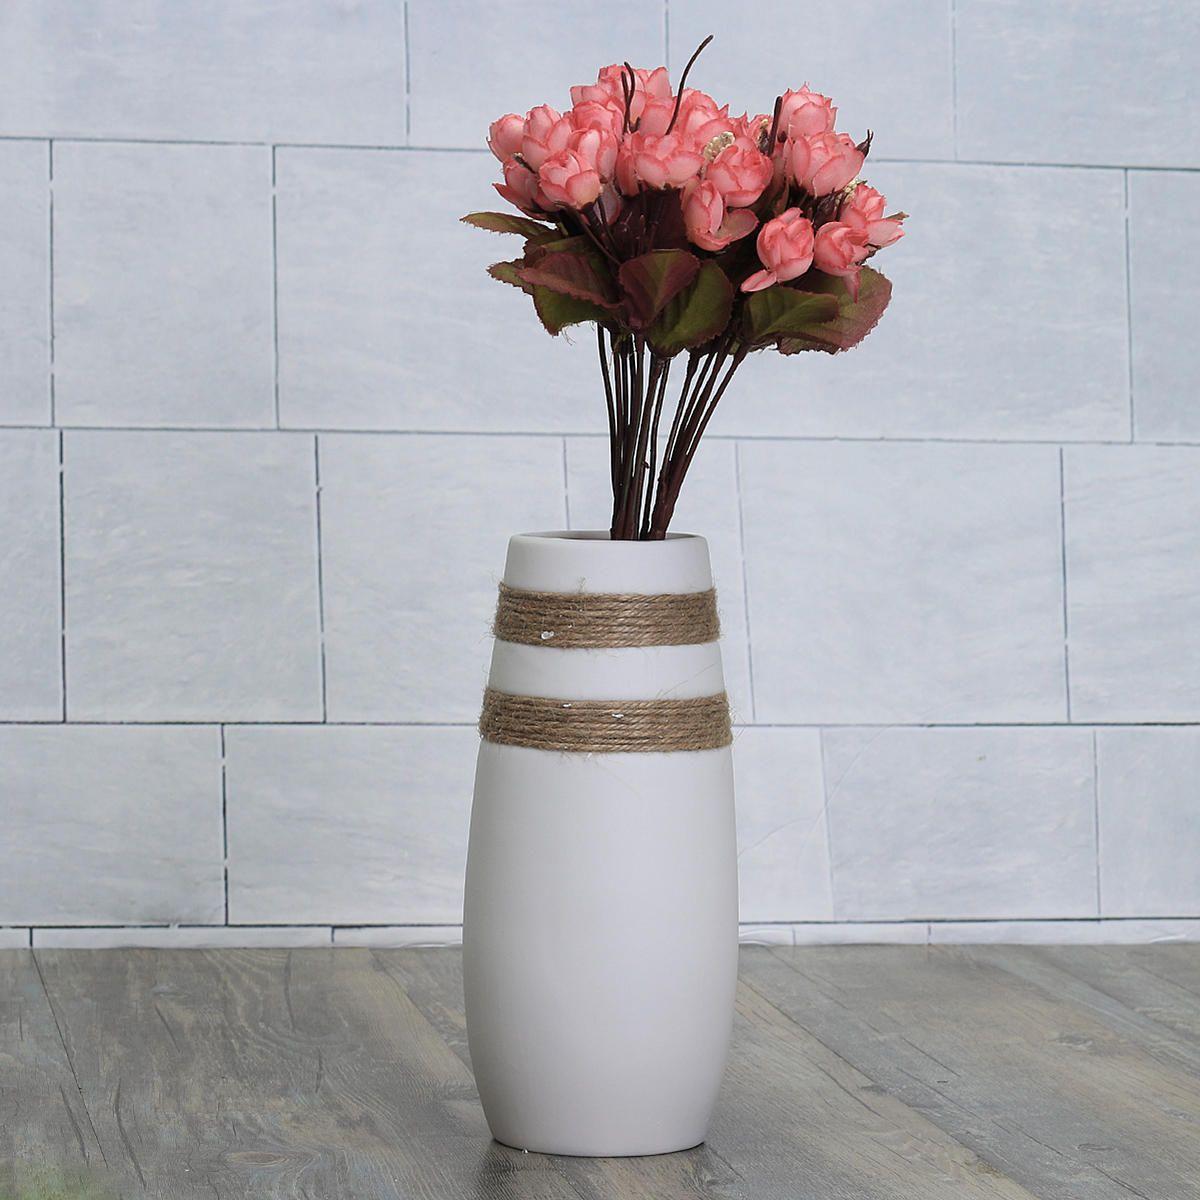 White Creative Modern Ceramic Flower Vase Handmade Flowers Bouquet on ceramic wall flowers, nerdy ceramic vases, vintage ceramic vases, ceramic candle holders, decorative vases, organic shaped ceramics vases, ceramic jars, cheap ceramic vases, bud vases, ceramic mugs, textured ceramic vases, antique vases, ceramic vases and urns, ceramic cups, ceramic vase designs, beautiful ceramic vases, cool ceramic vases, handmade ceramic vases, ceramic square vases, ceramic flower vessels,